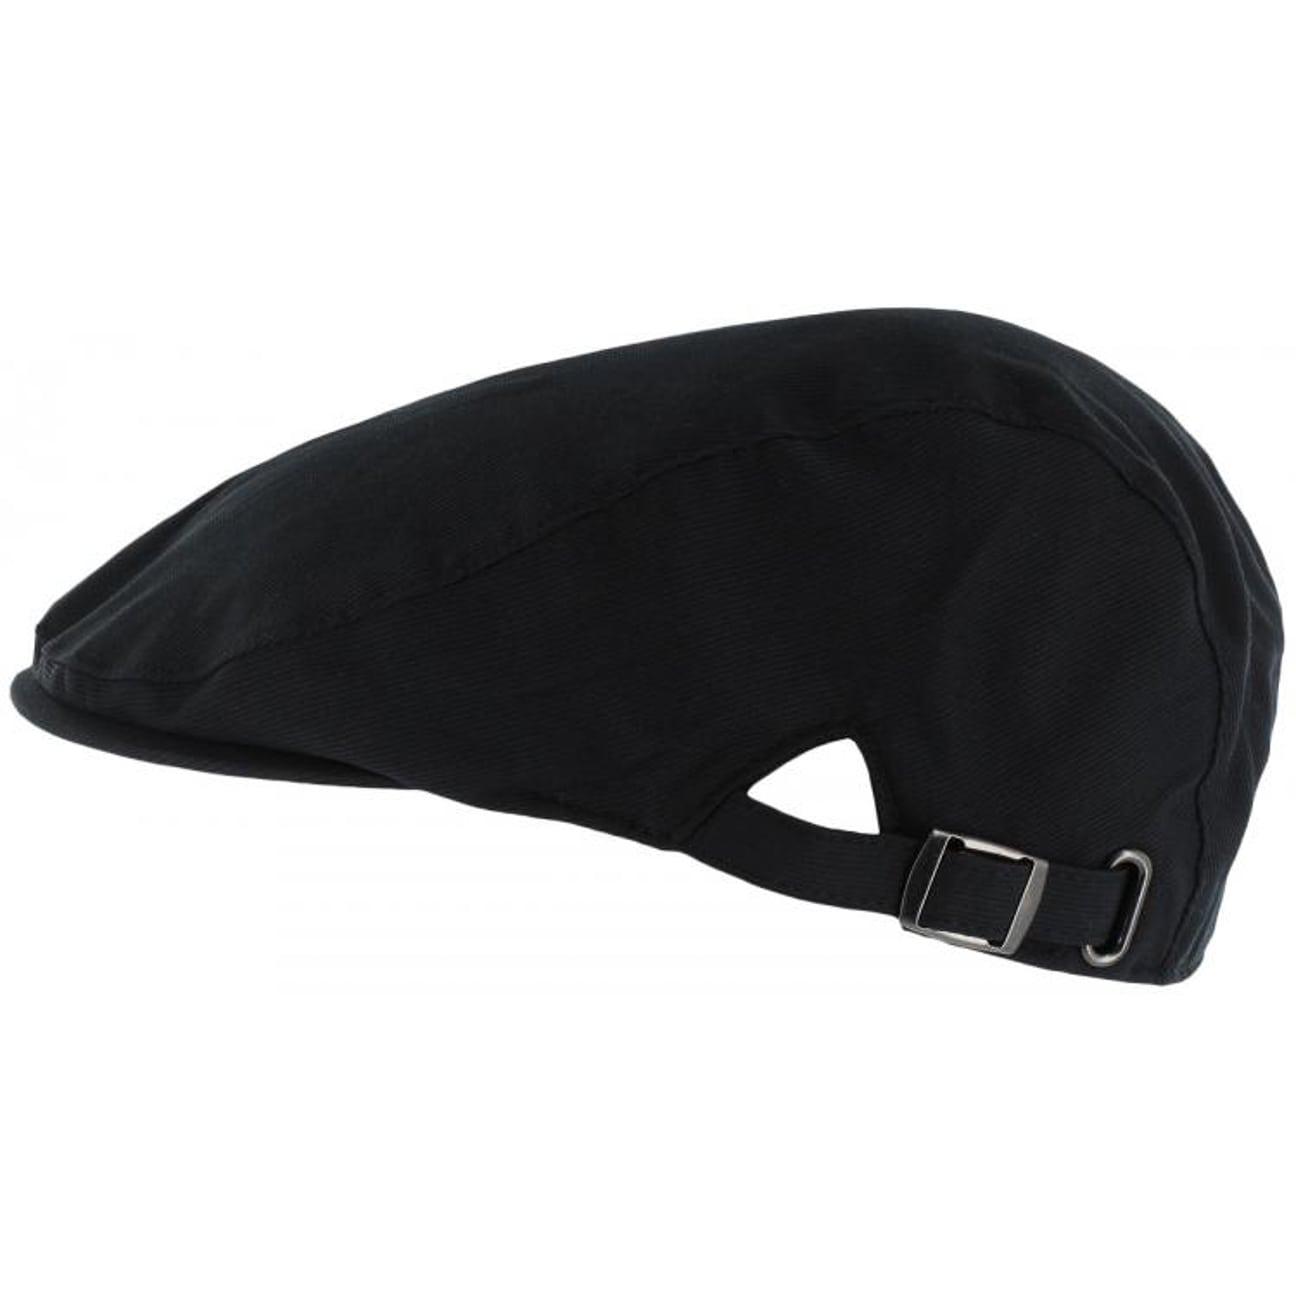 f2800db4bf9 ... Border Flat Cap by Nike - black 1 ...